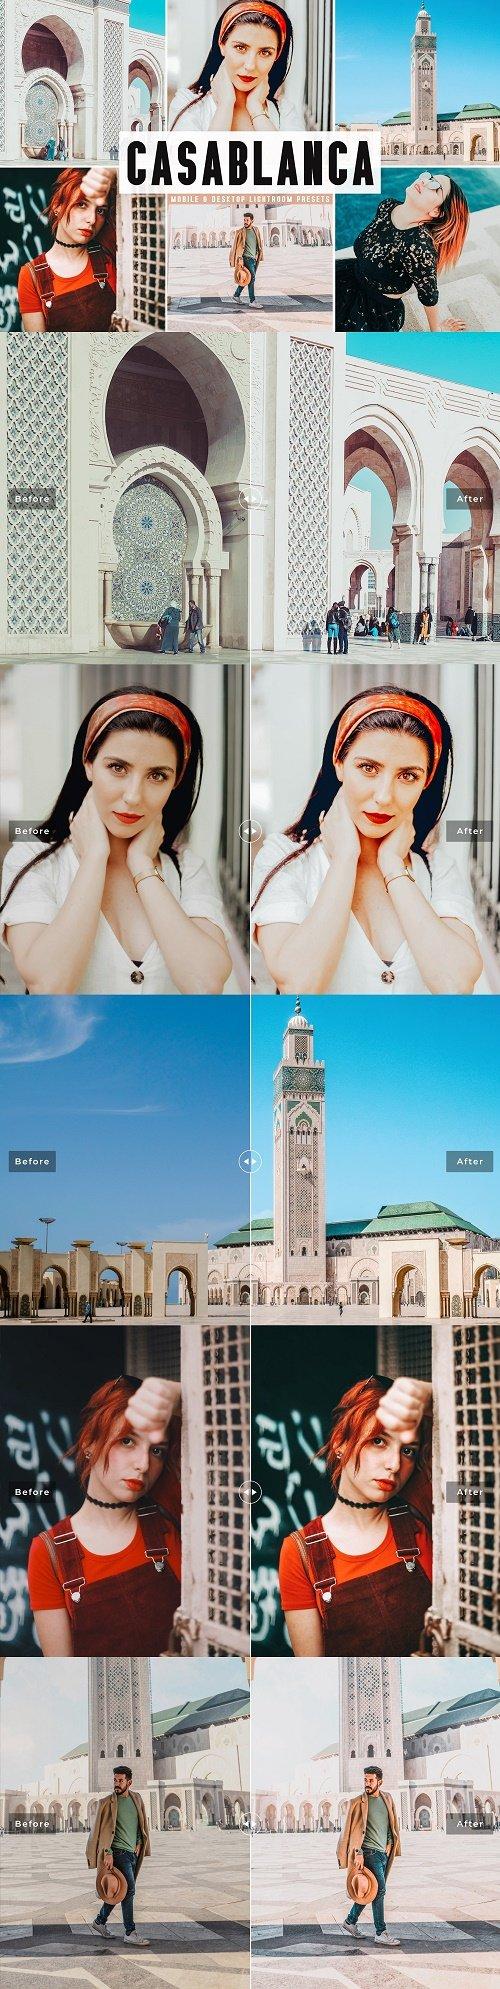 Casablanca LRM Presets Pack - 4614370 - Mobile & Desktop